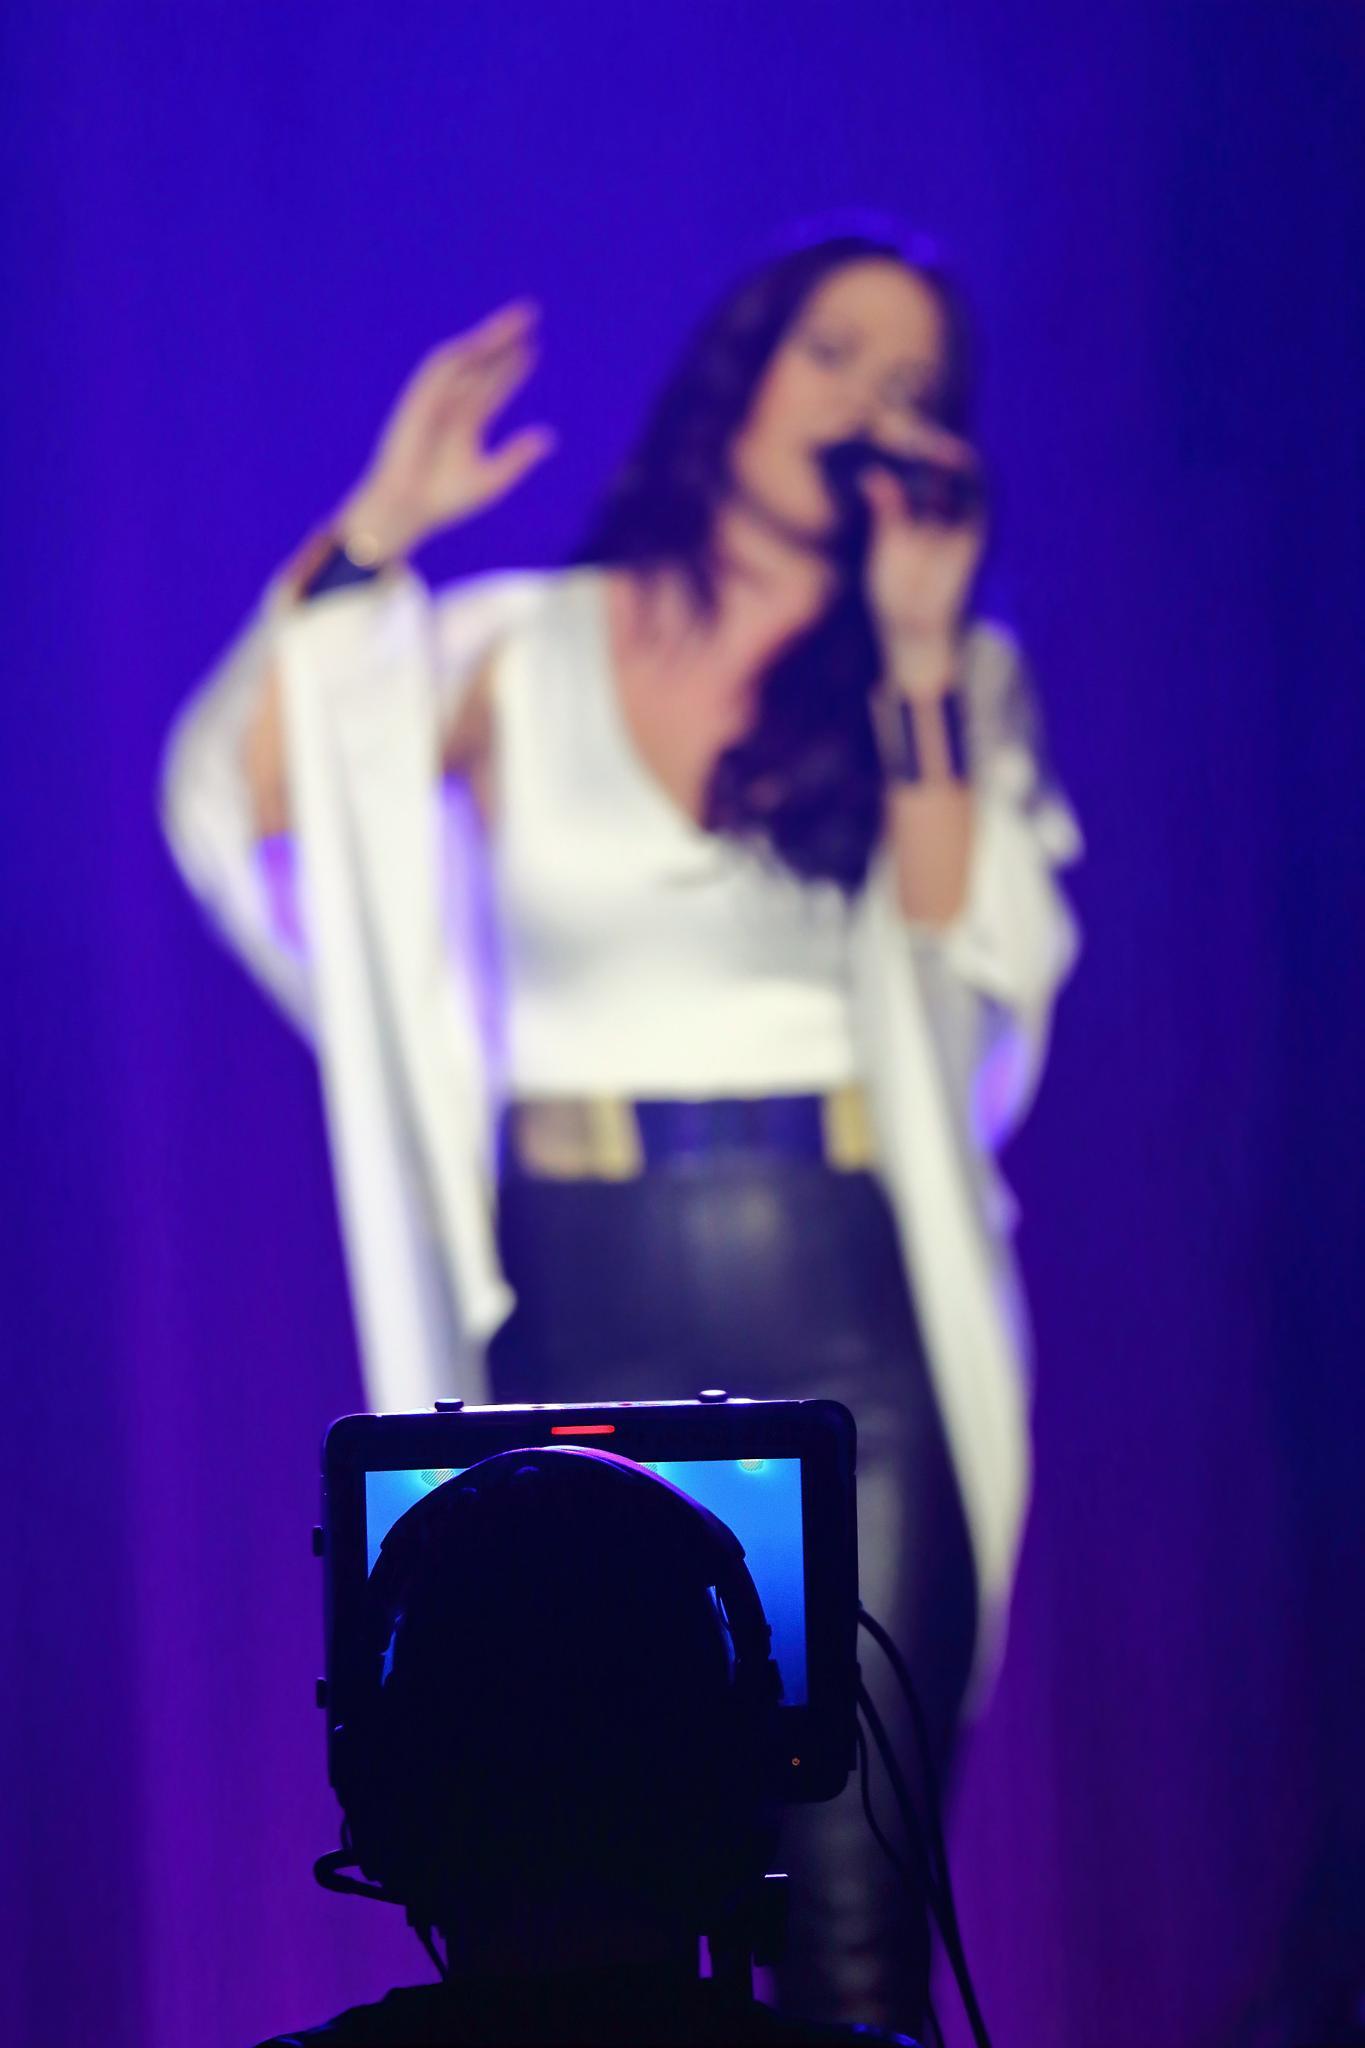 Cameraman filming the artist  by SRFOTO